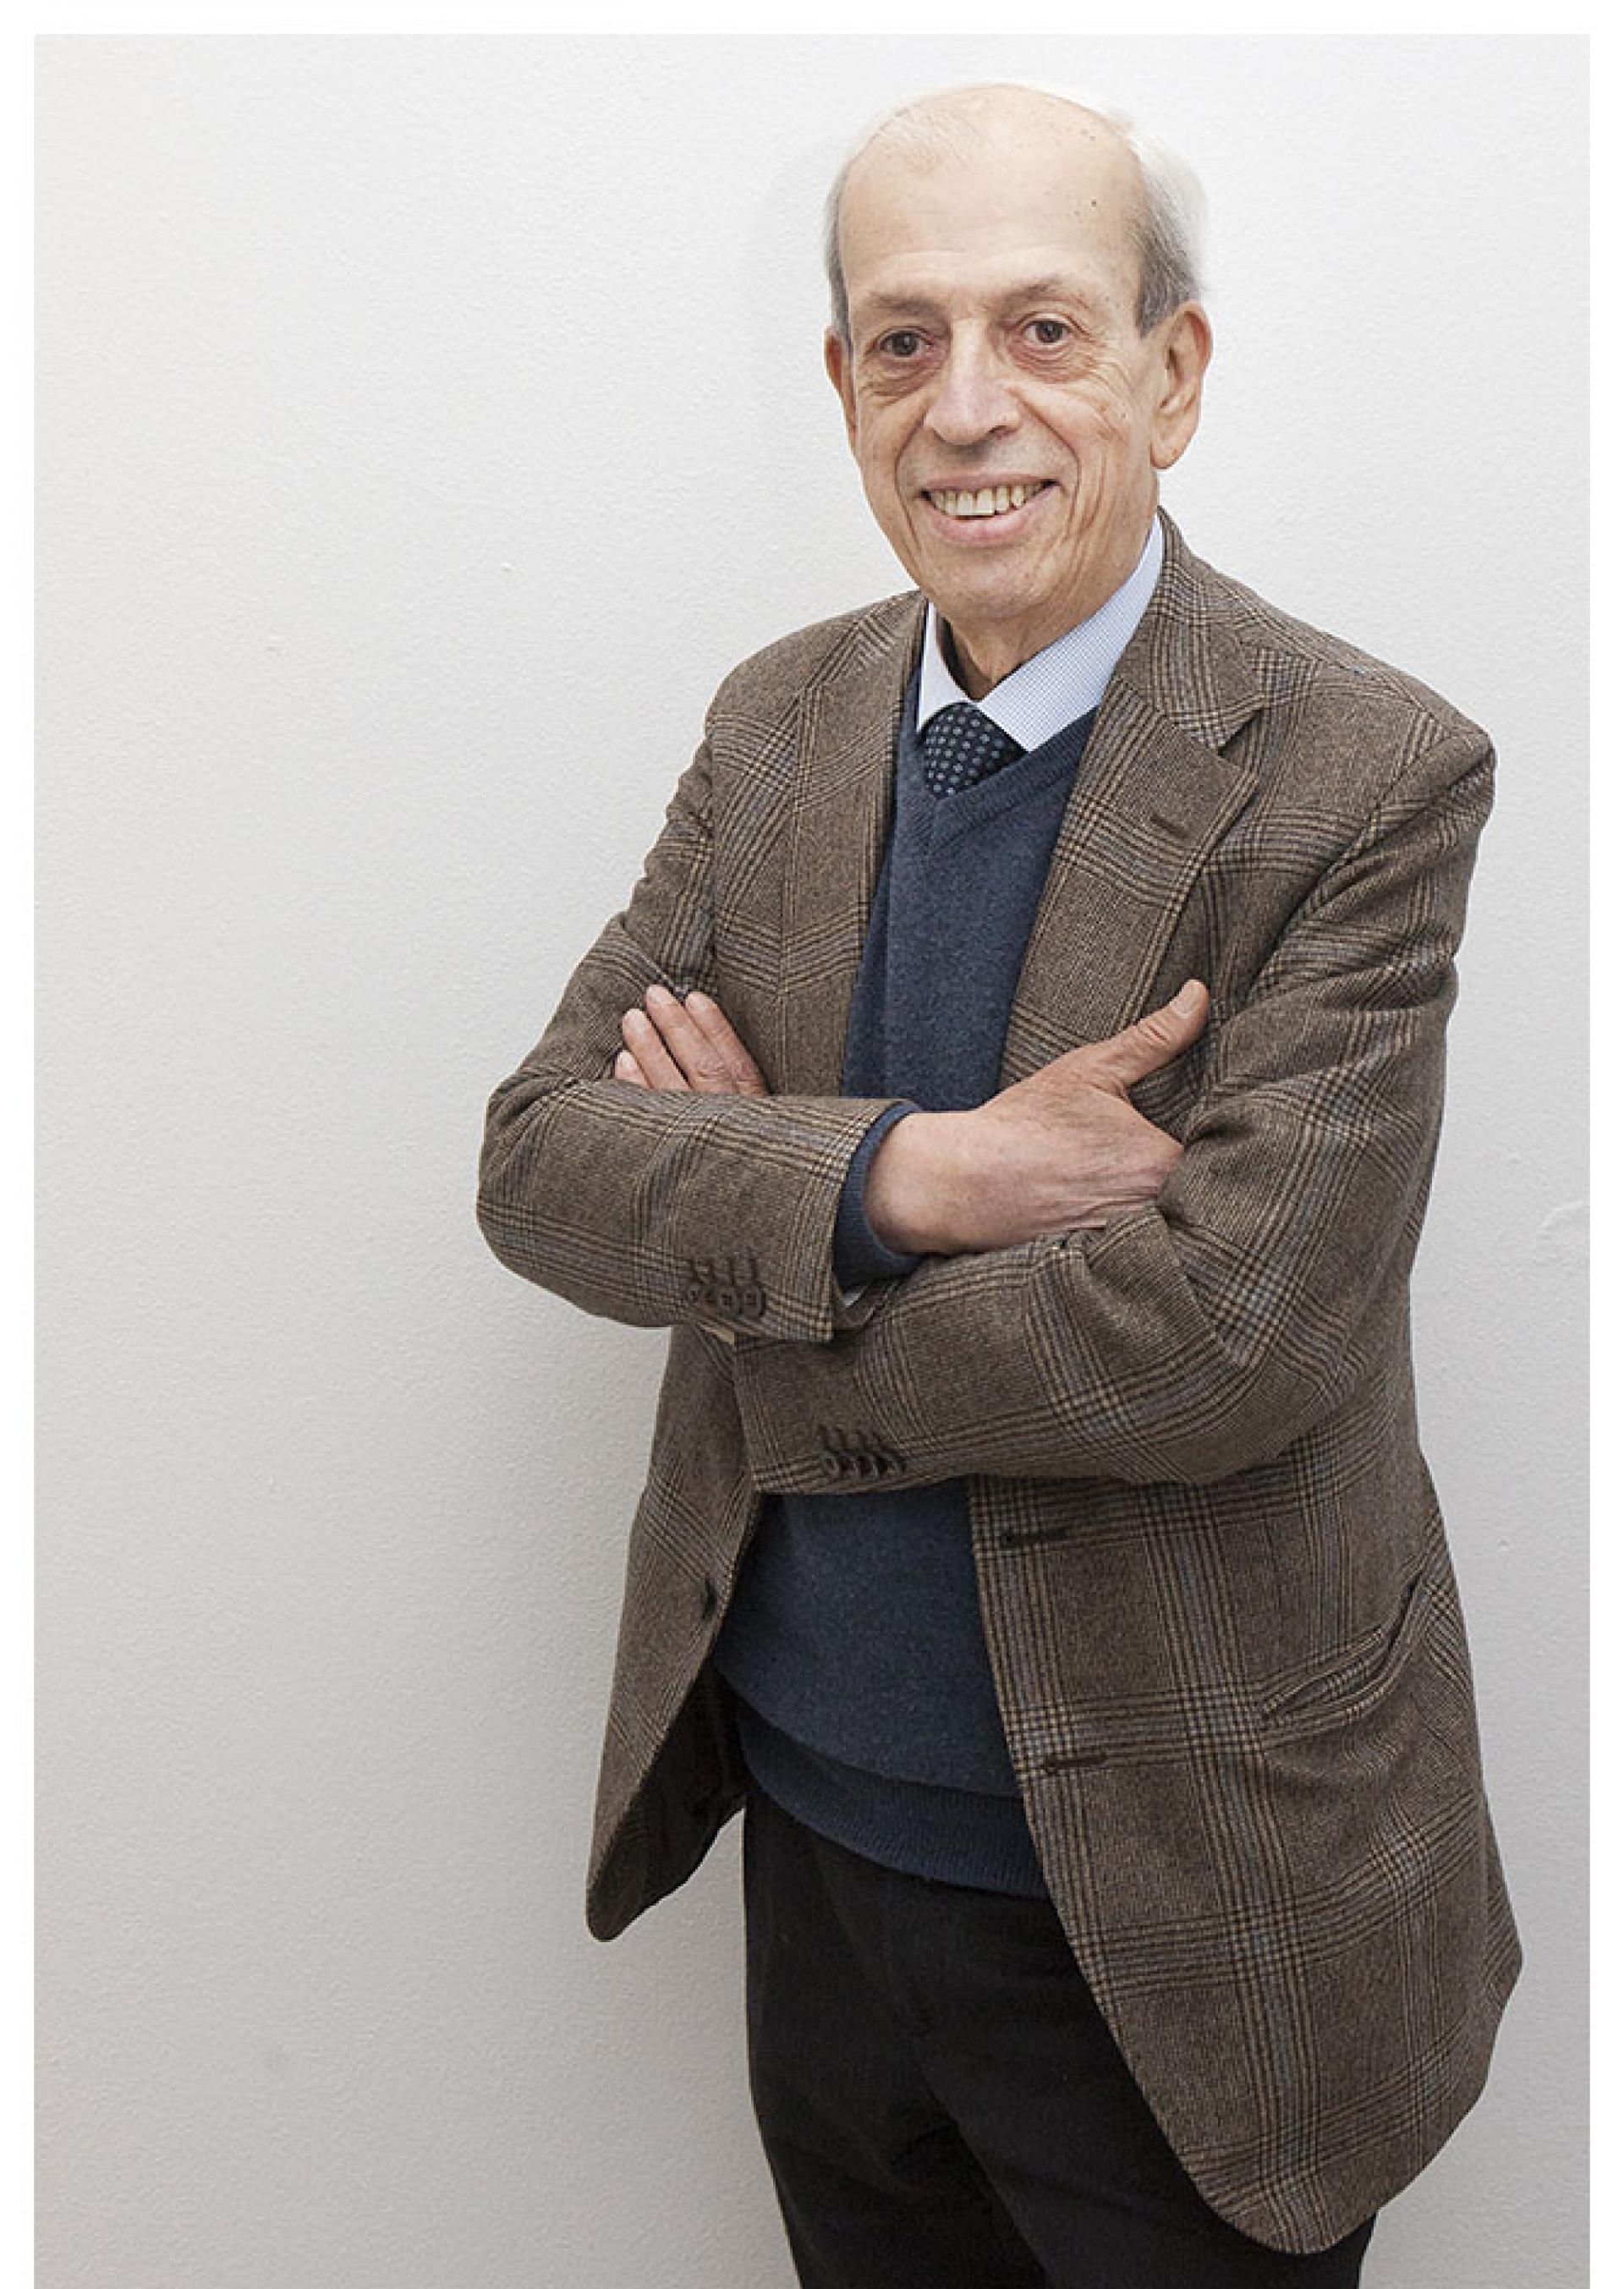 Claudio Ranzani